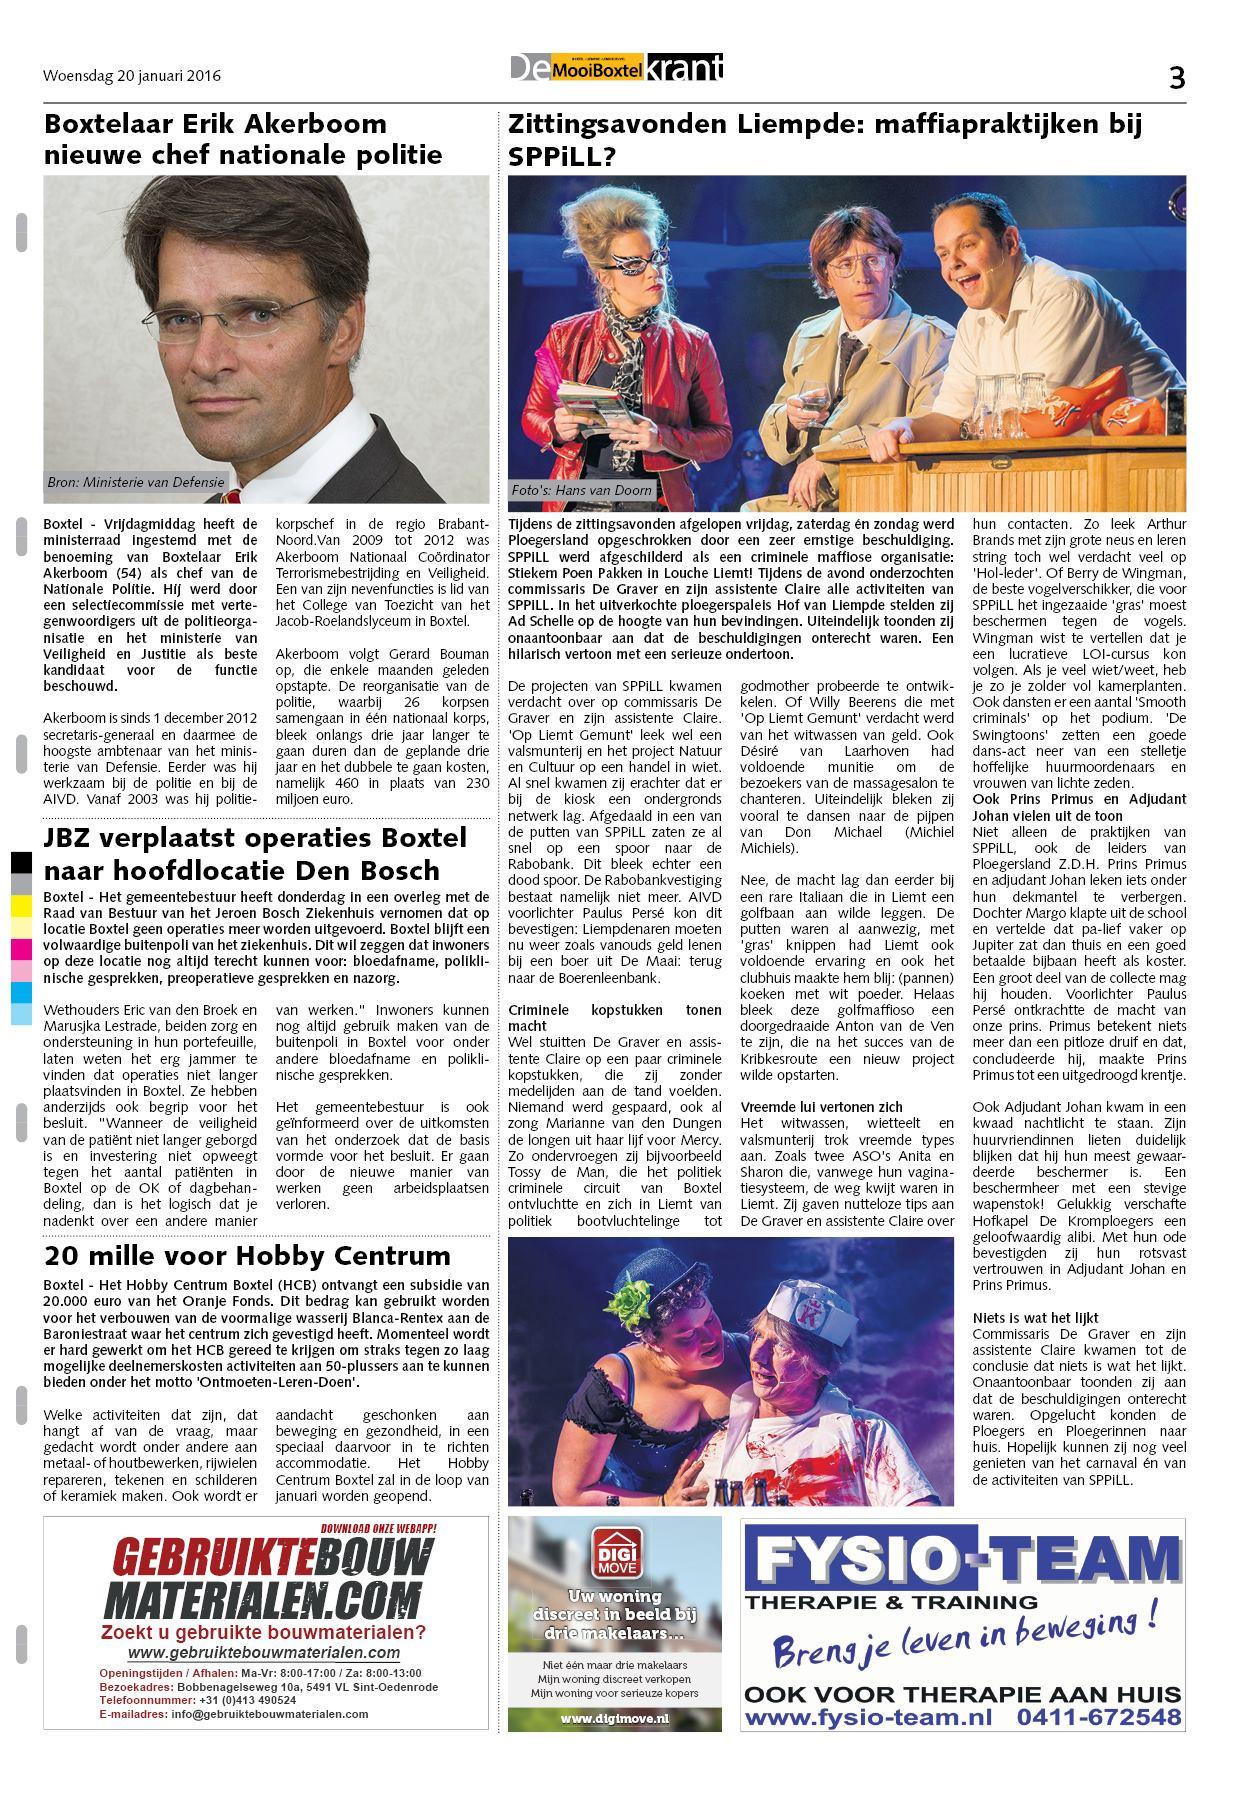 Demooiboxtelkrant 20 Januari 2016